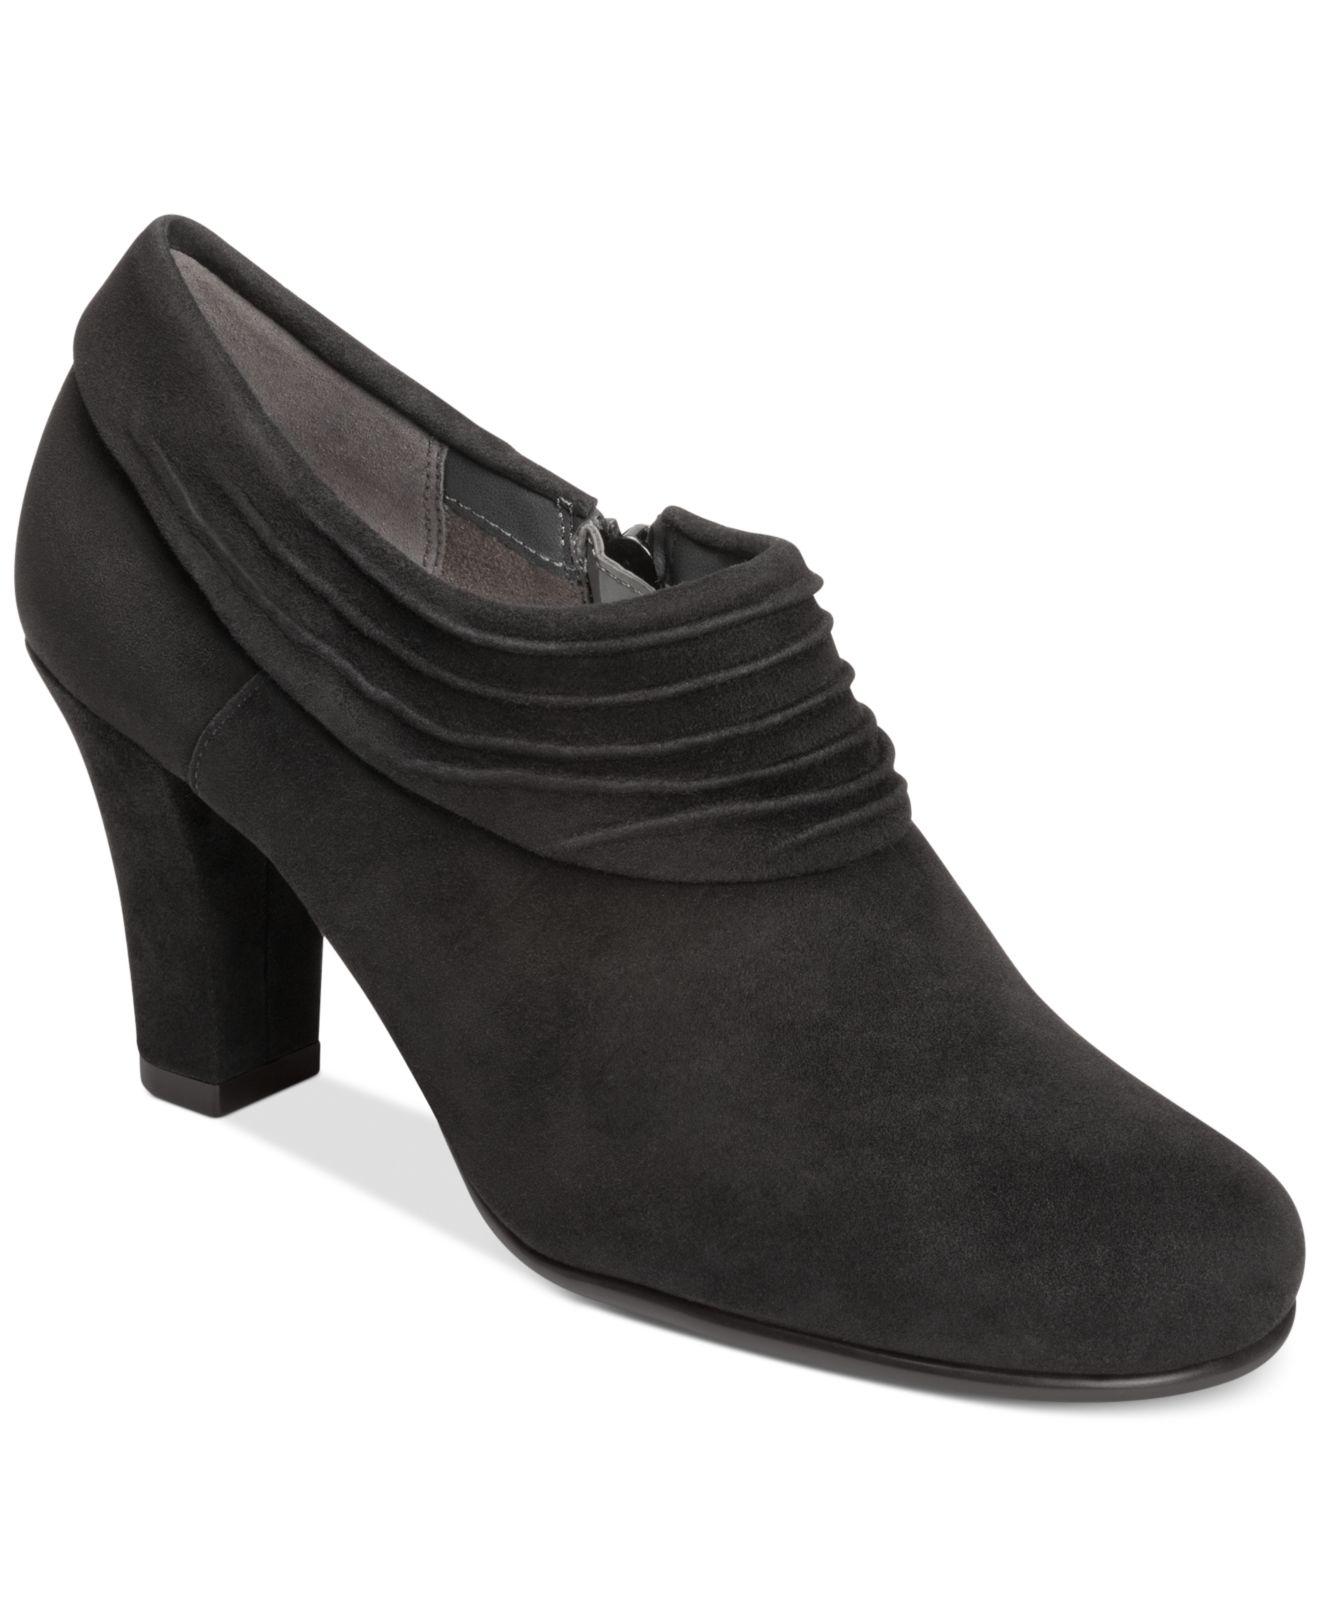 Black  In Heel Closed Toe Shoes Aerosoles